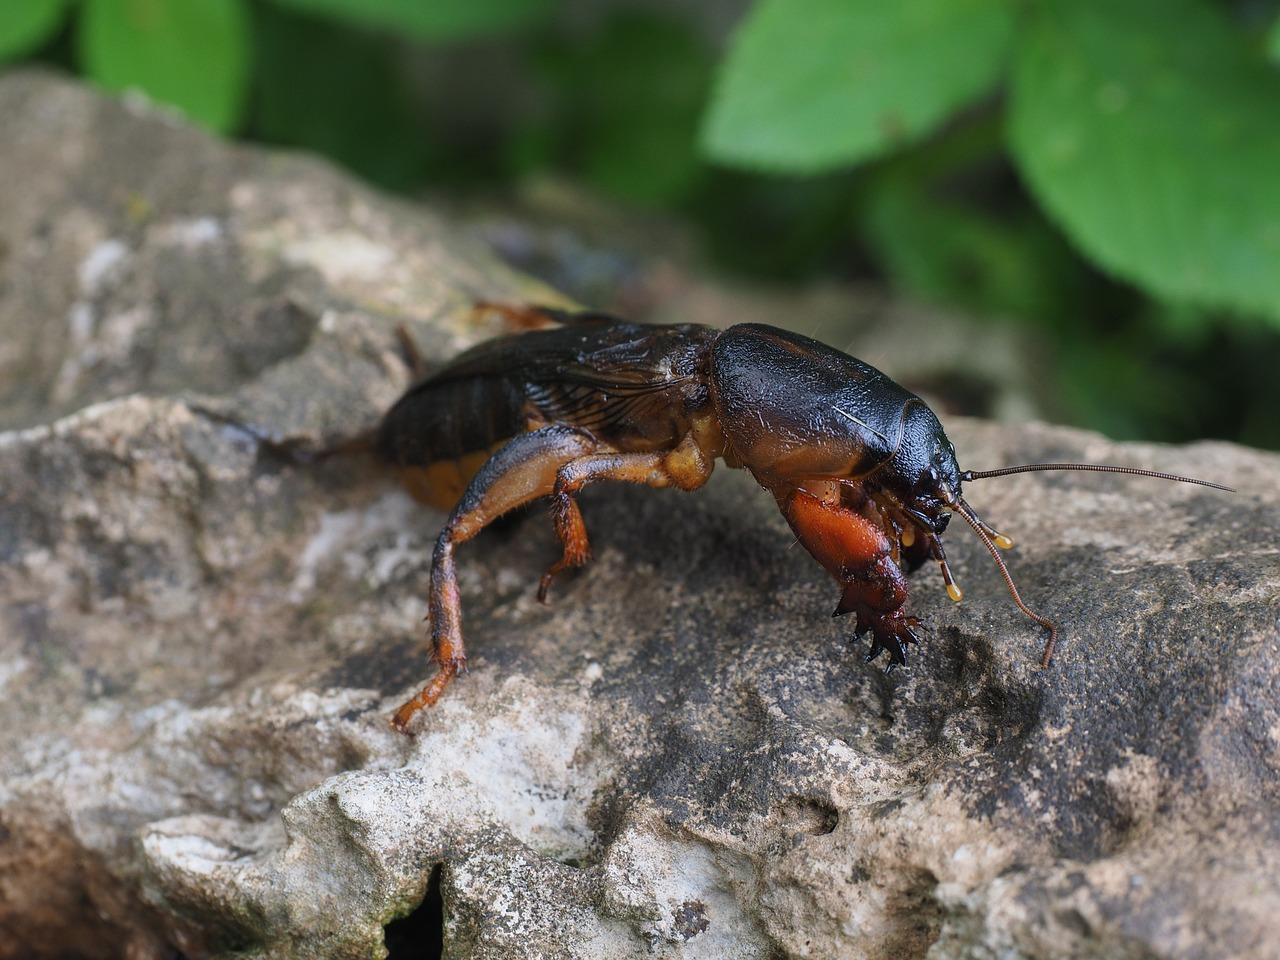 mole-cricket-medvedka